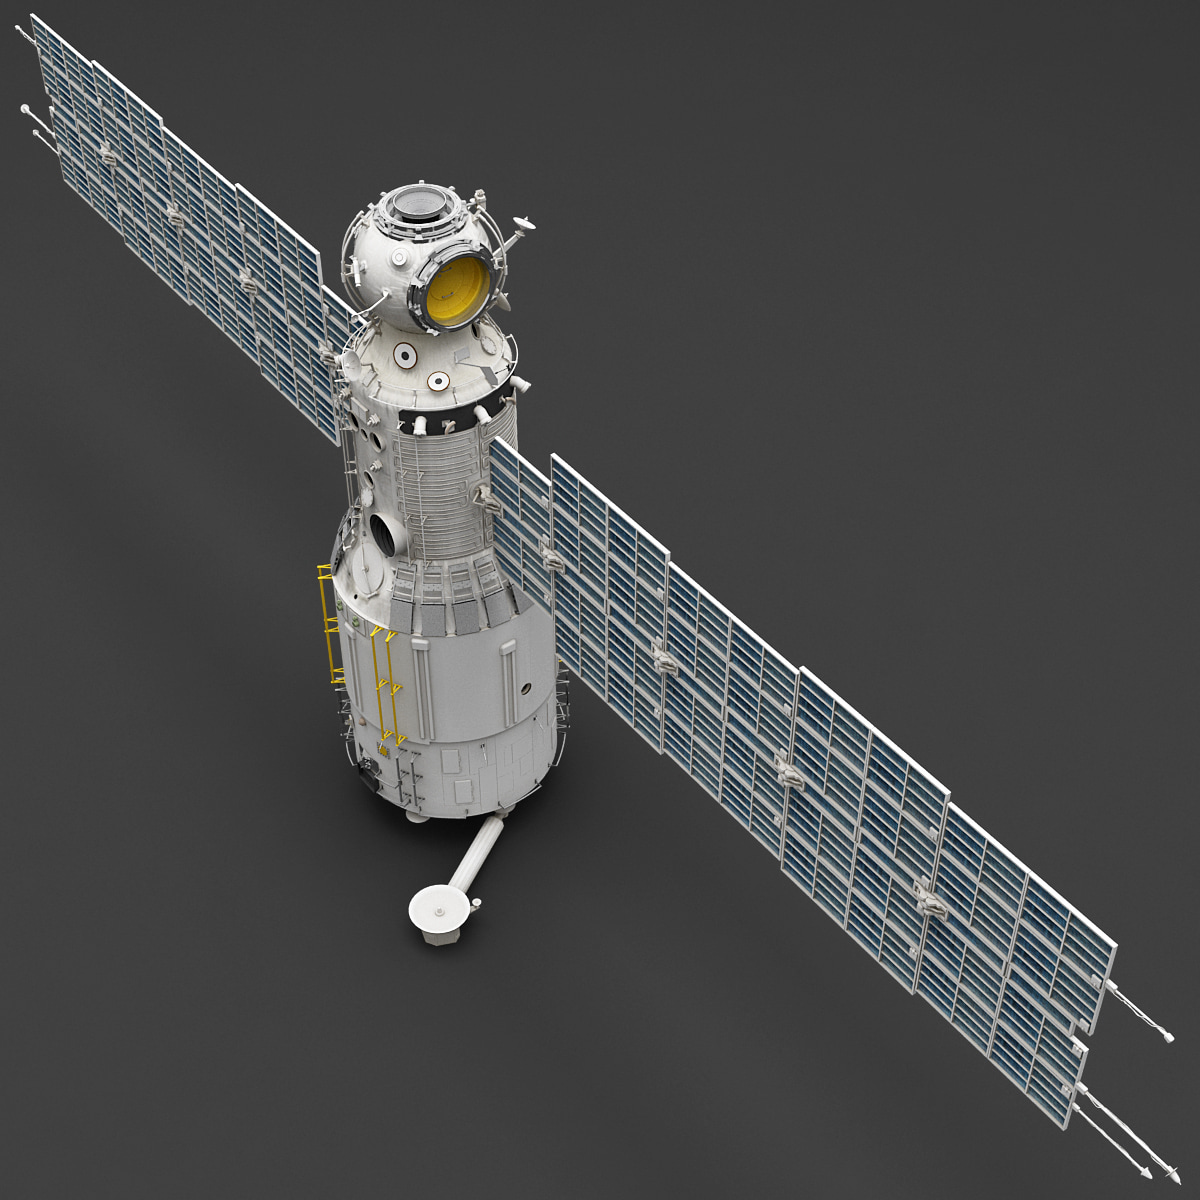 Space_Service_Module_Zvezda_0001.jpg